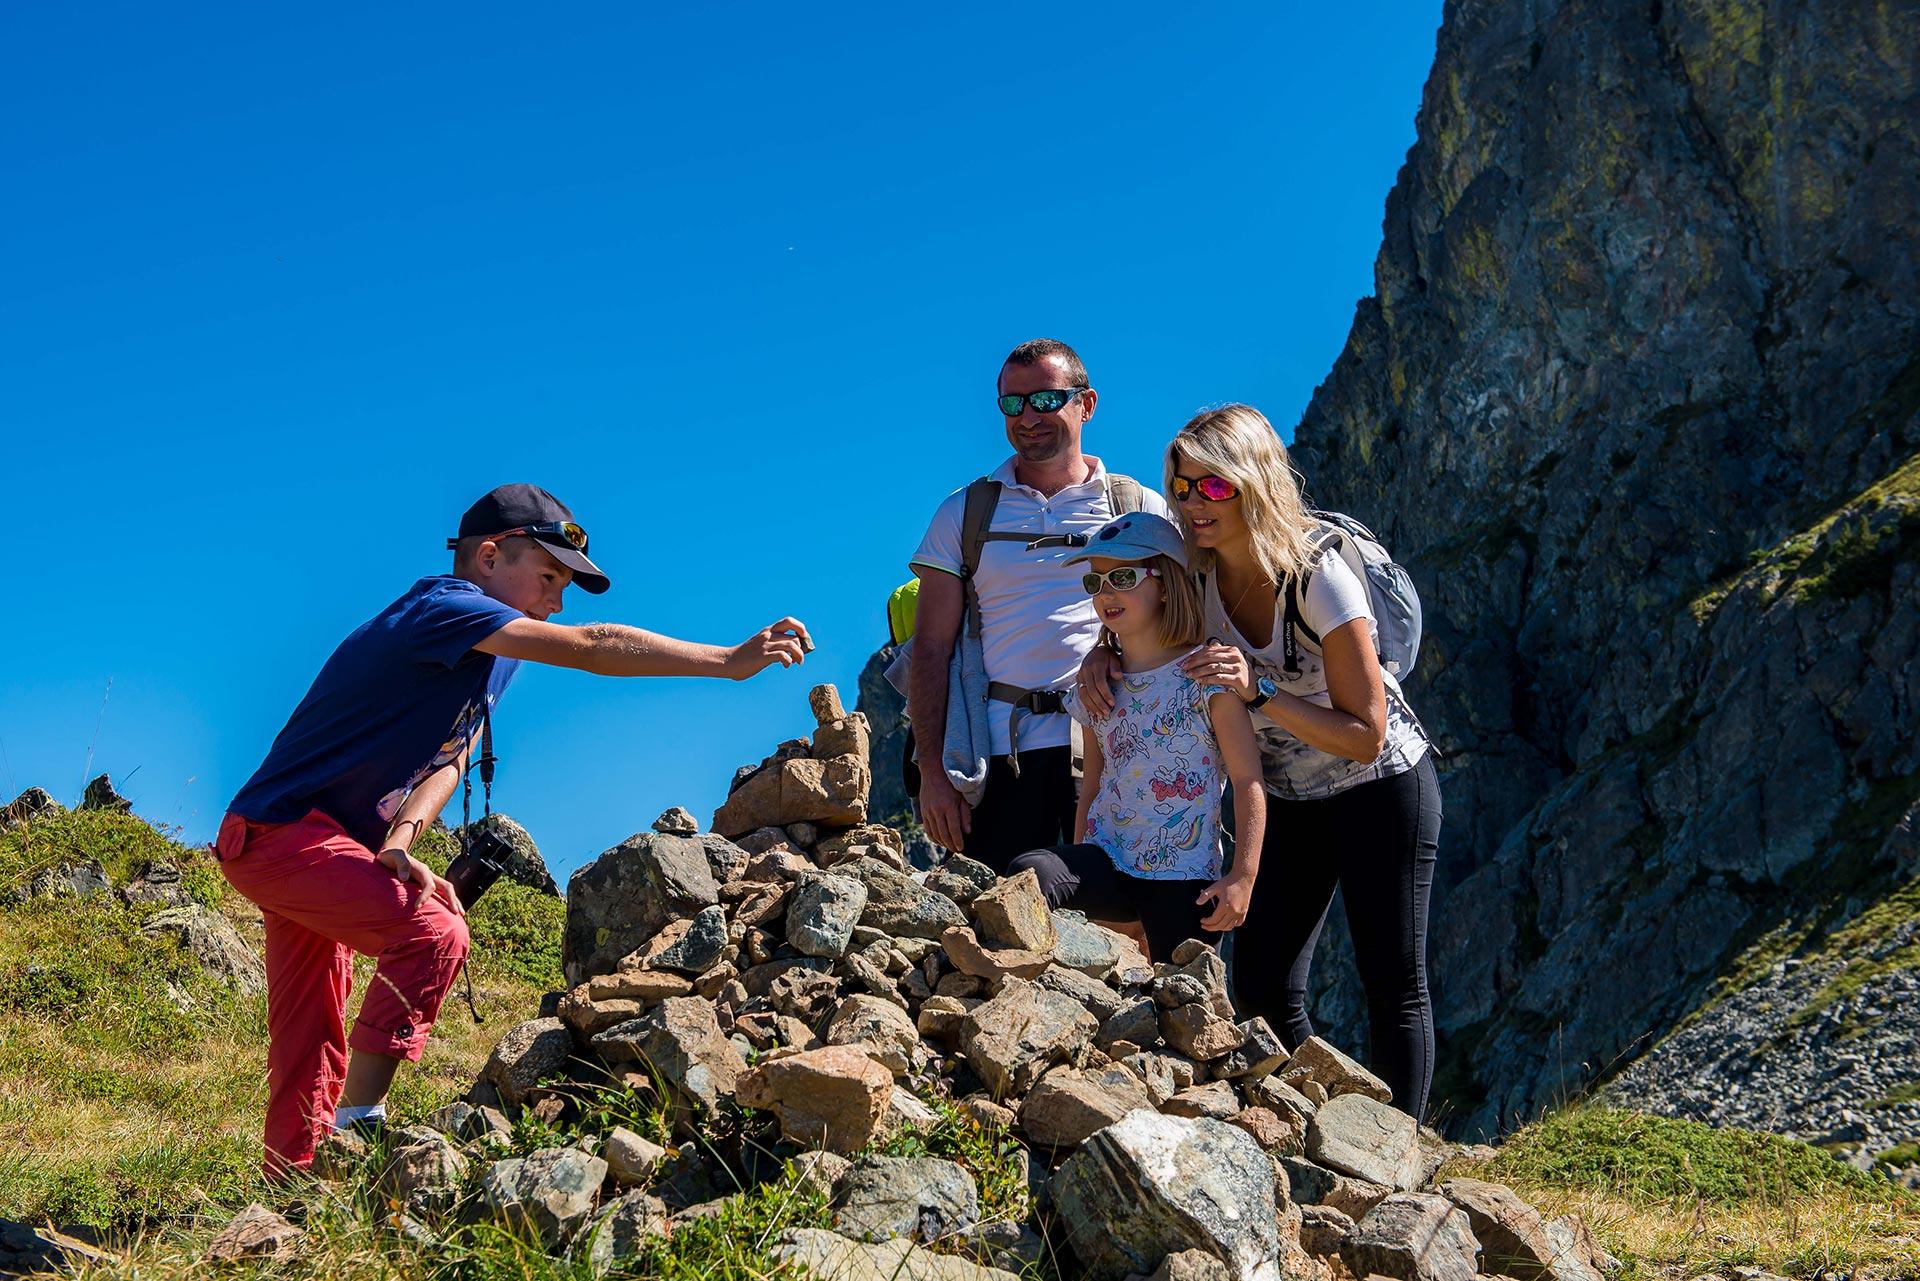 Chamrousse randonnée cairn famille station montagne grenoble isère alpes france - © Images-et-reves.fr